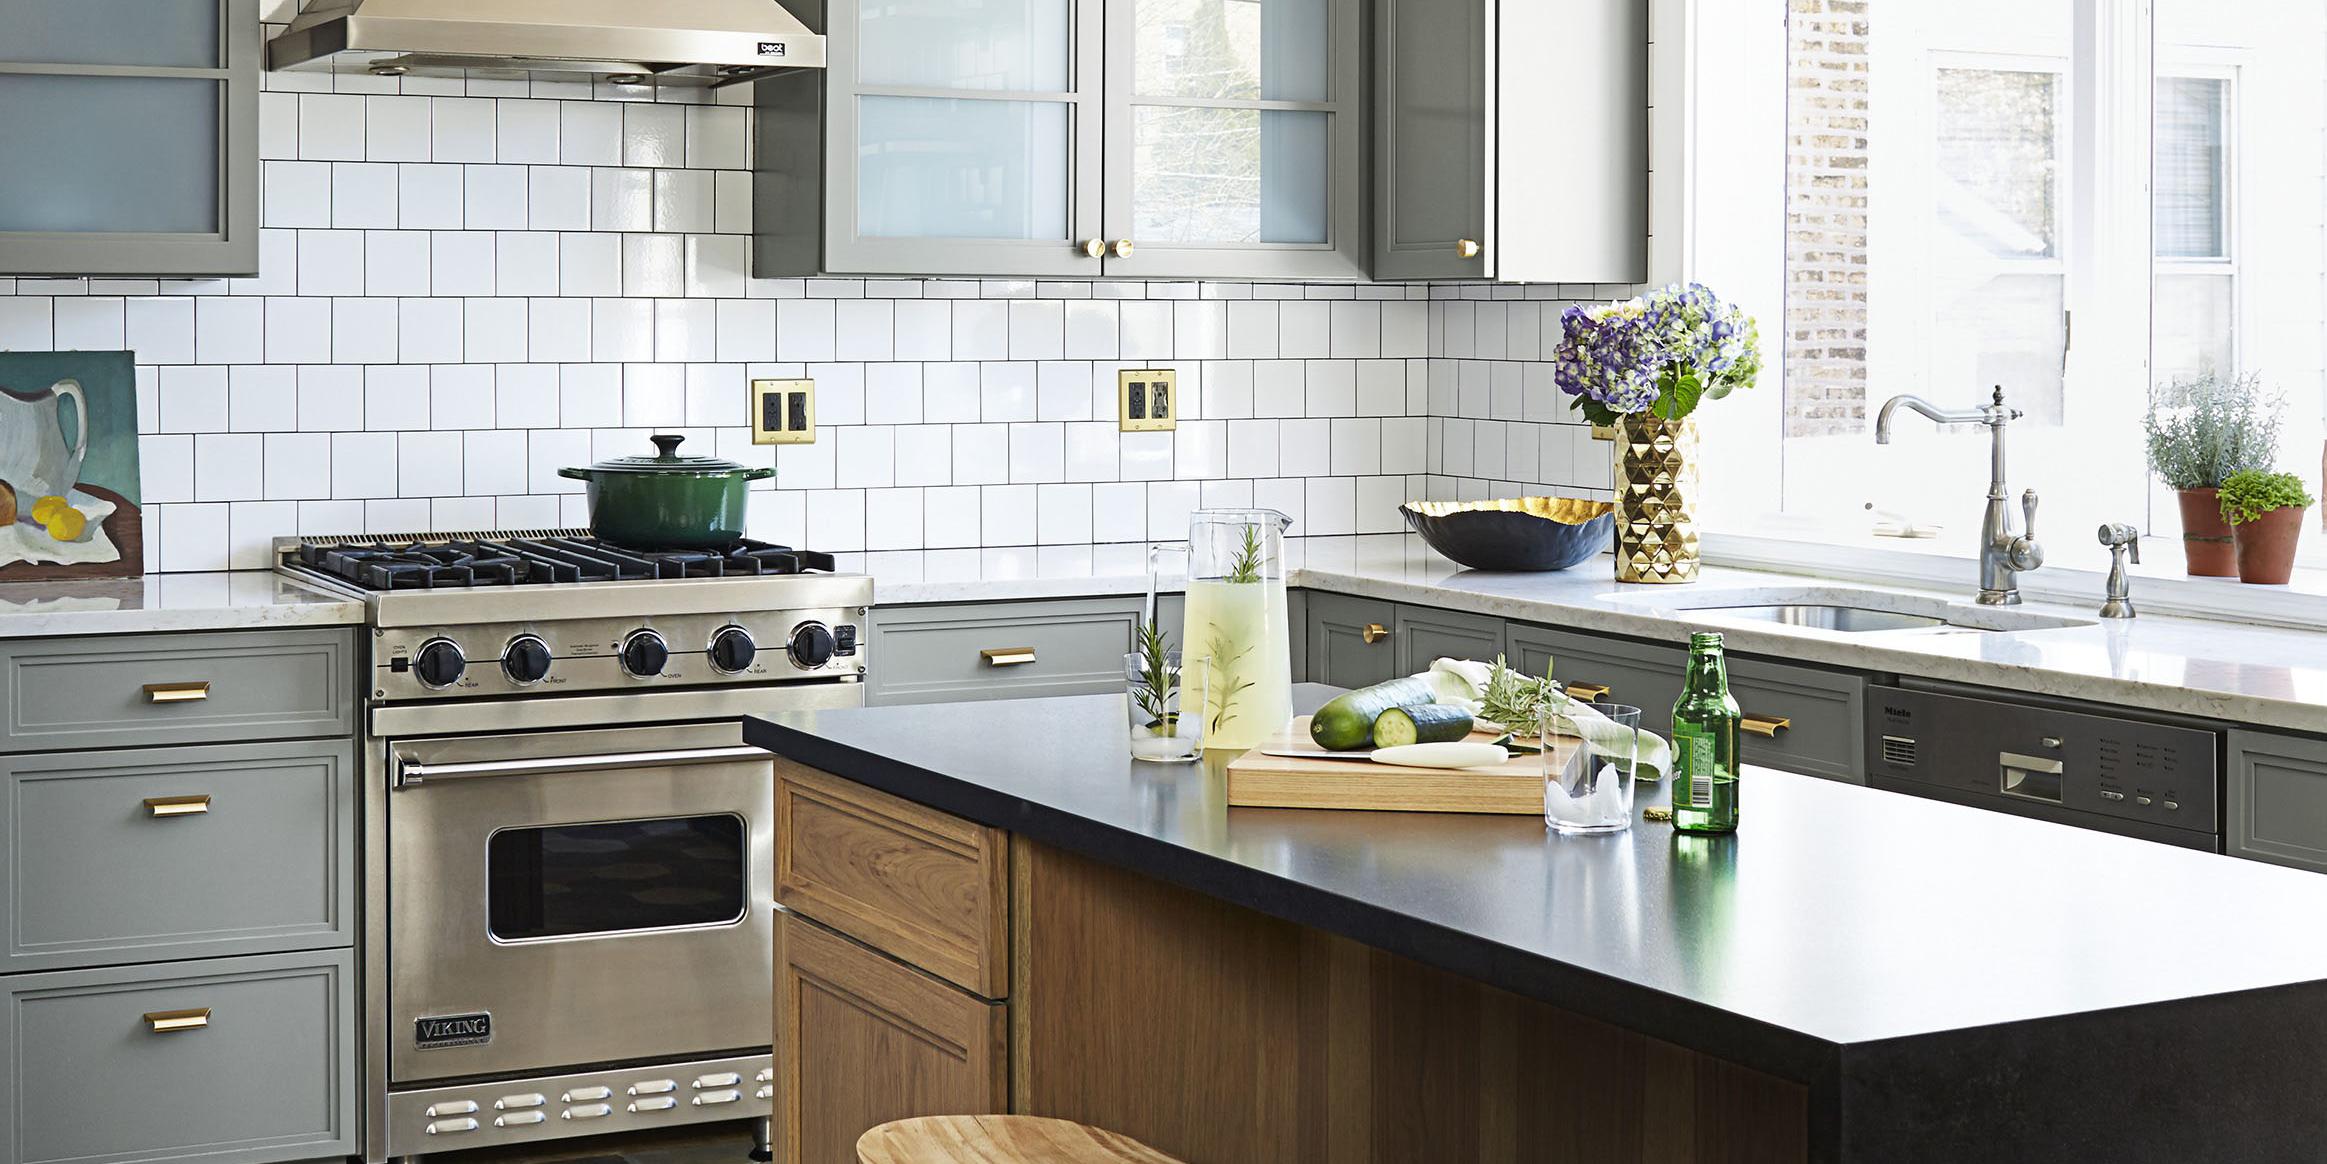 family kitchen designed by suzann kletzien house